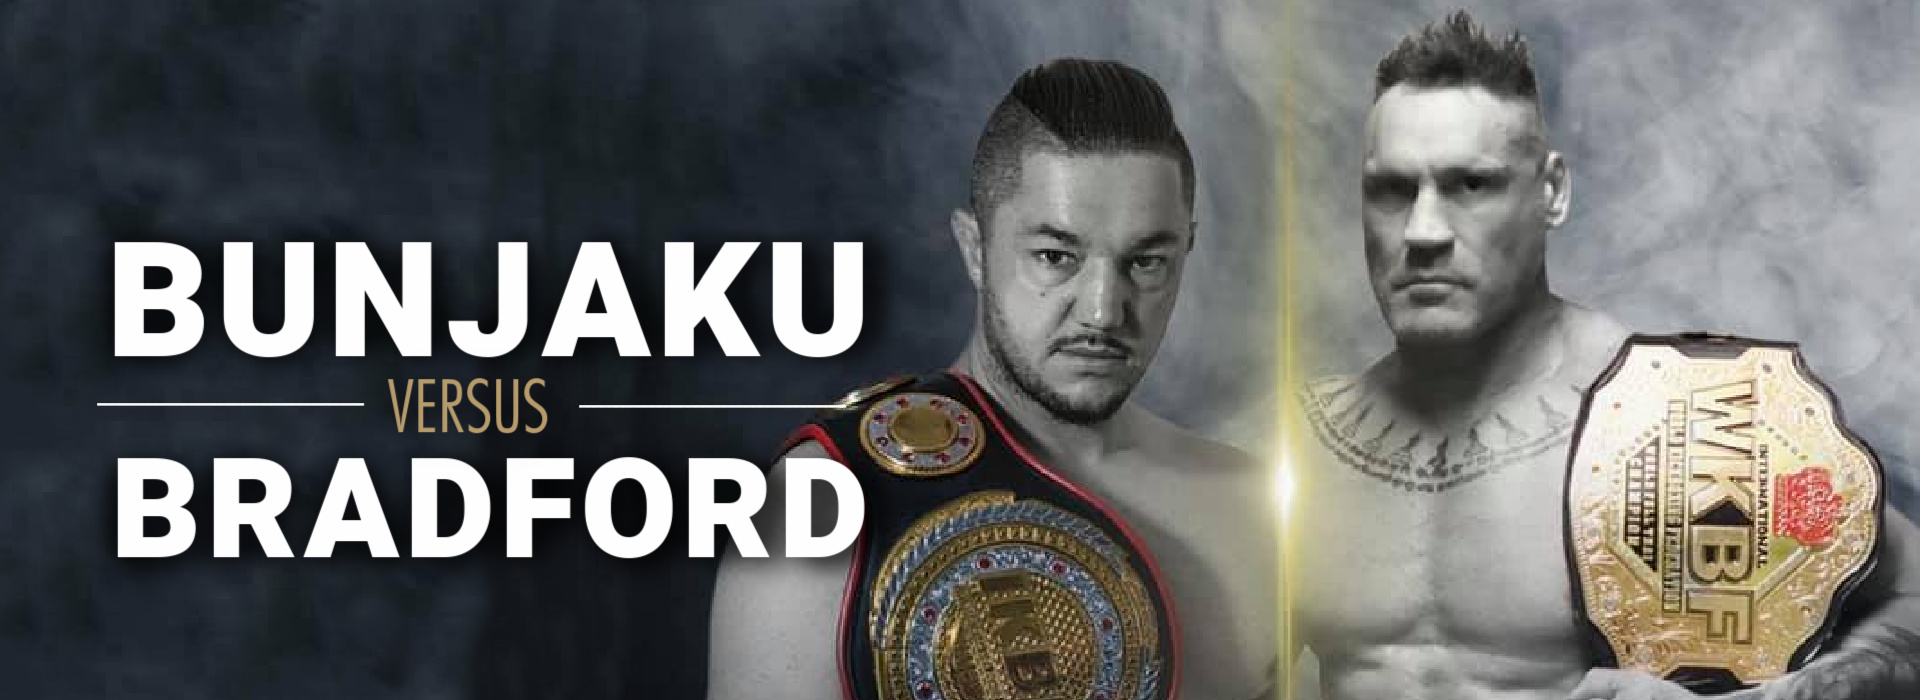 Chris Bradford's World Heavyweight Title